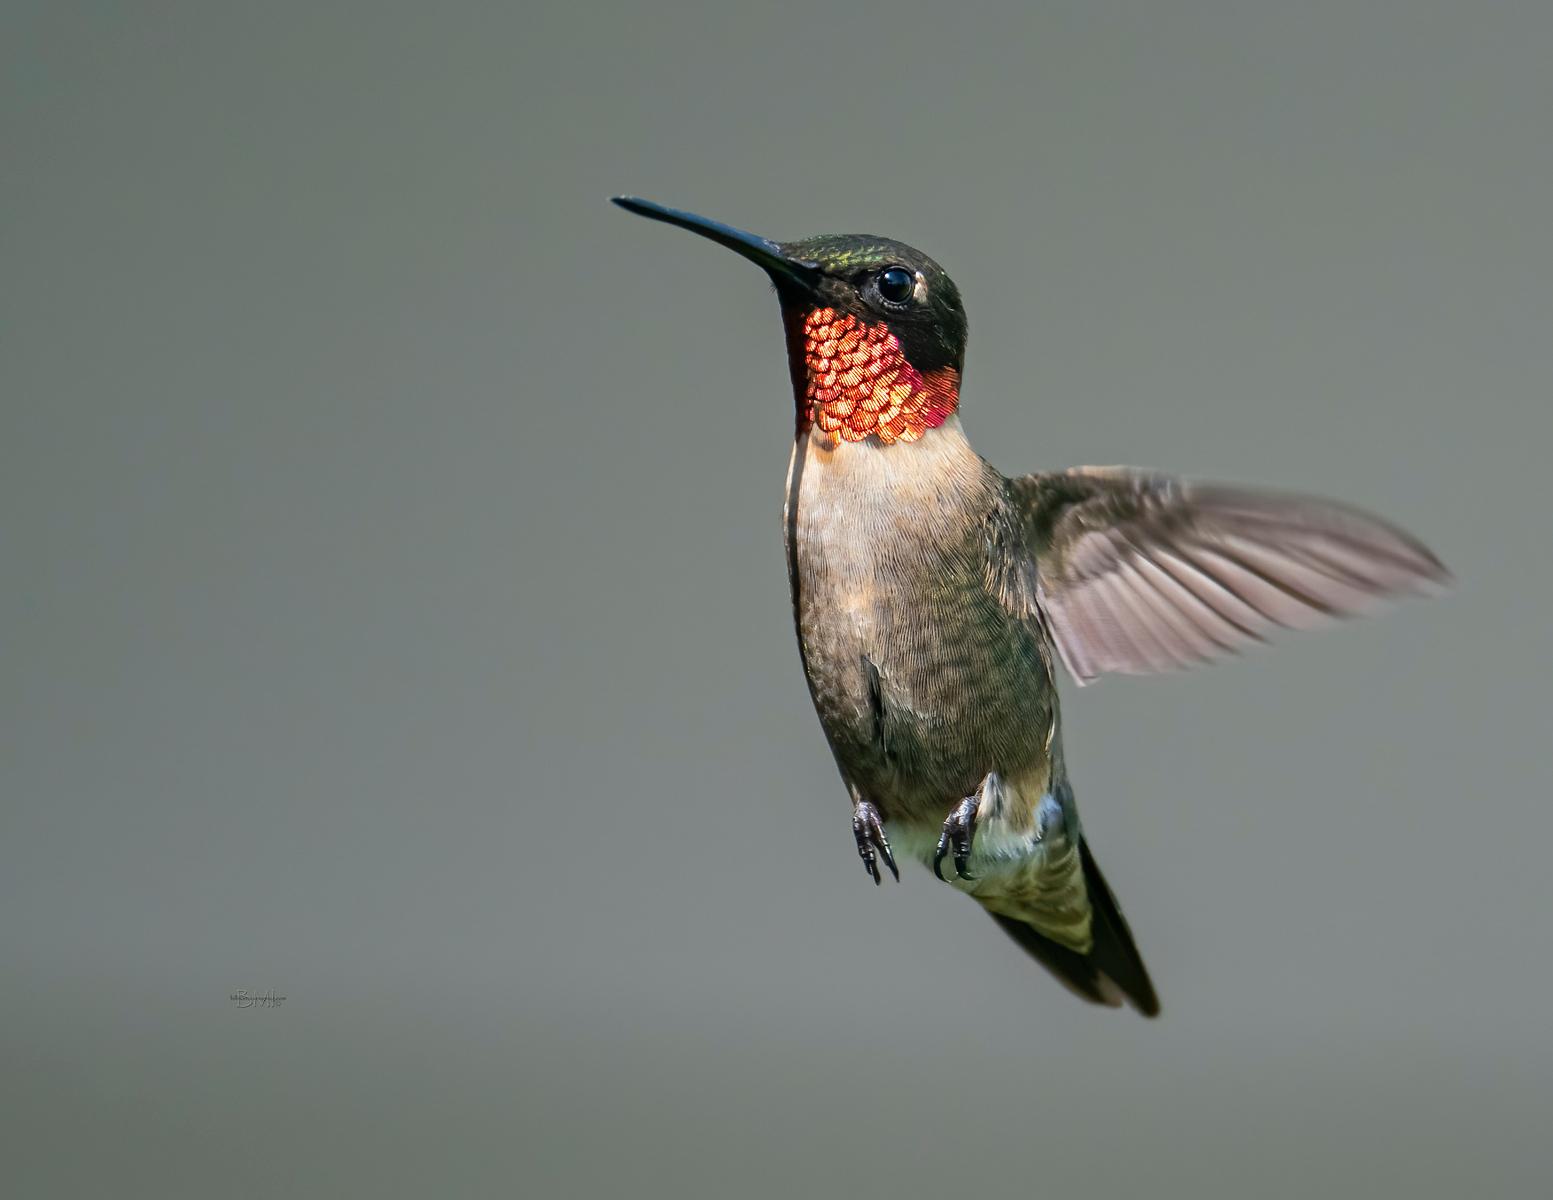 IMAGE: https://photos.smugmug.com/Beautyinthetreesandintheair/Birds-in-2021/Hummingbirds-2021/i-2r9cvJD/0/39ef99c9/X3/RT%20Hummingbird_9_9-7-21-X3.jpg